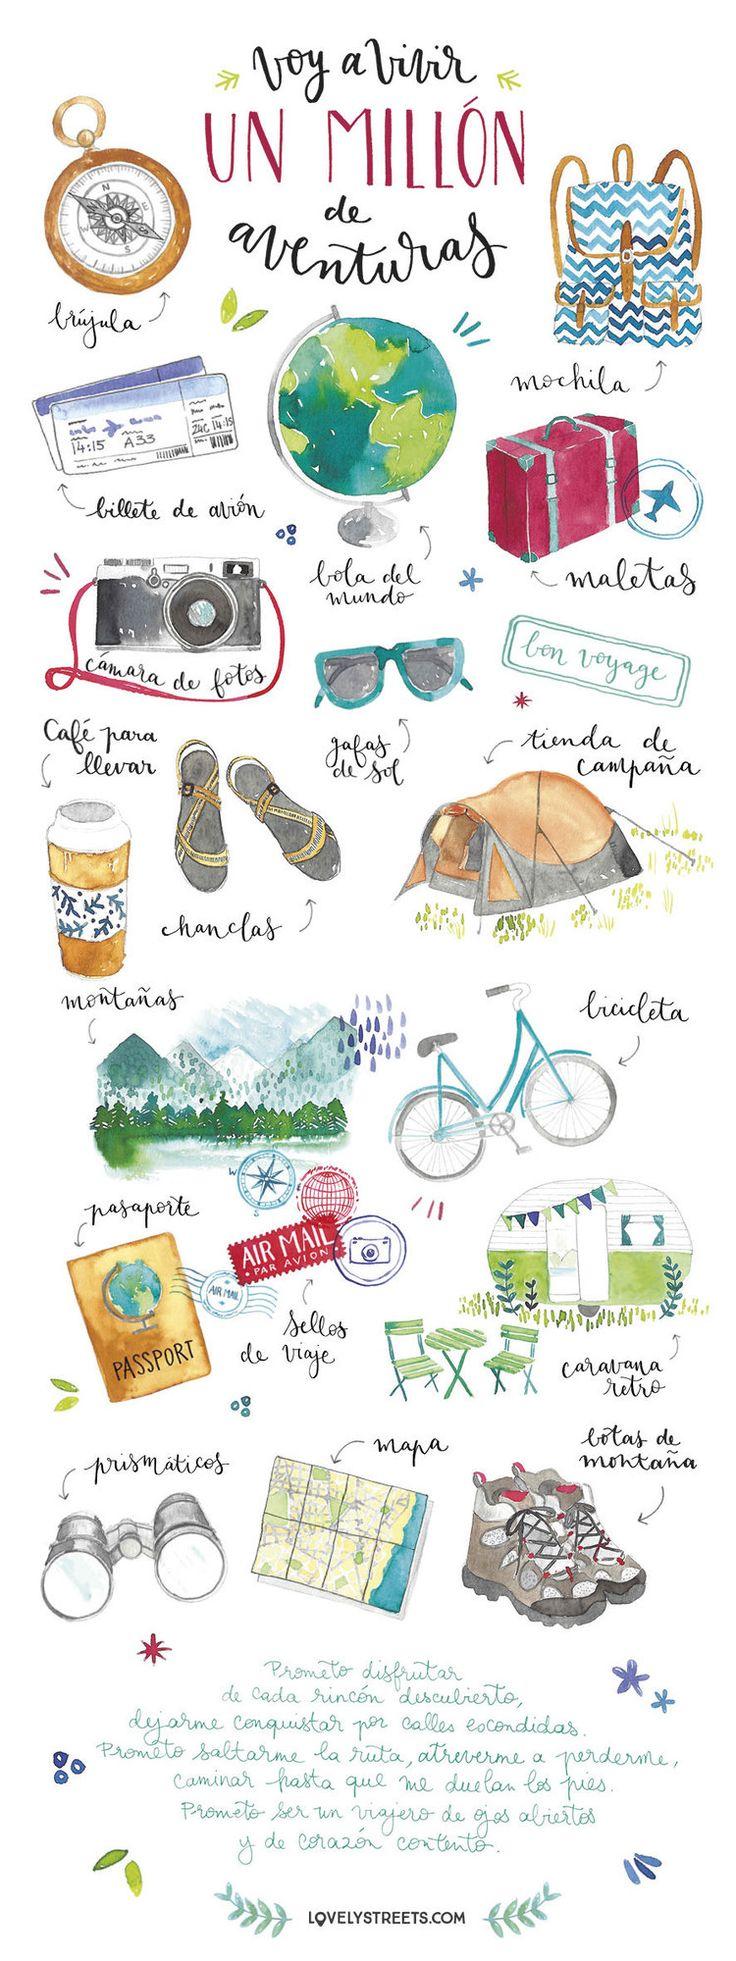 I am gonna live a million adventures - Travel illustrations for Lovely Streets — Studio Kalumi